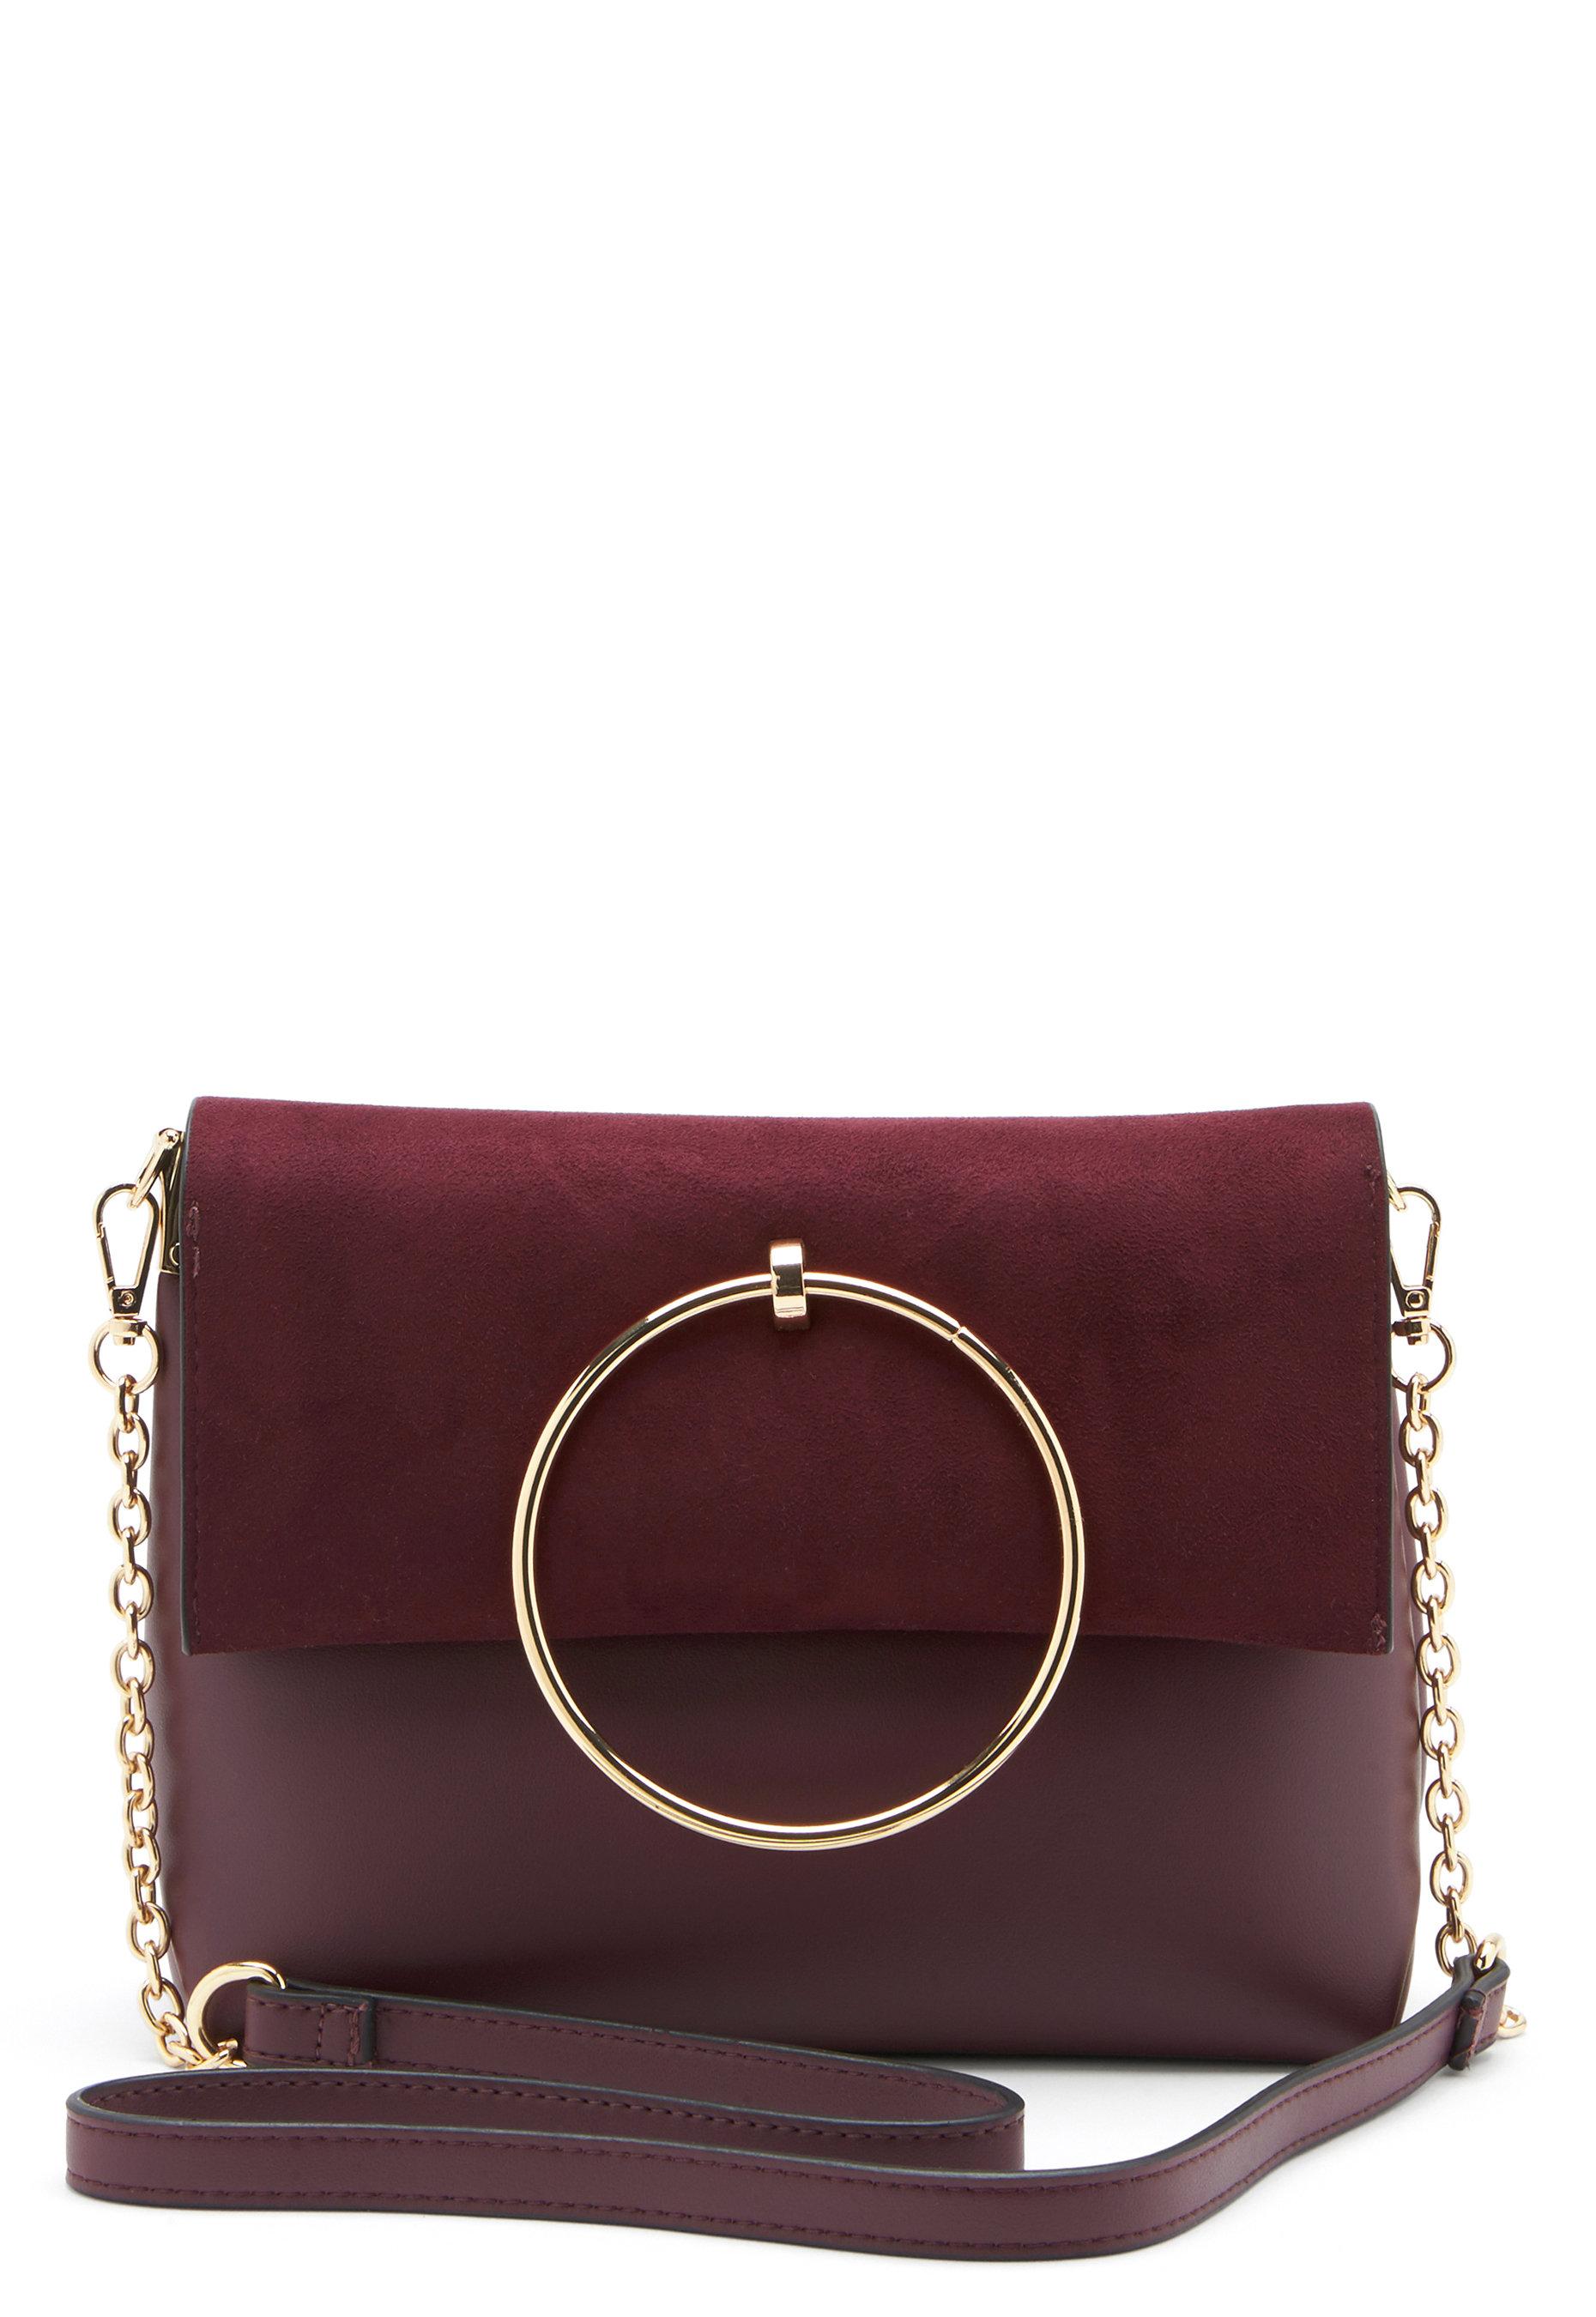 49a106a10c New Look Matilda Metal Handle Bag Dark Burgundy - Bubbleroom